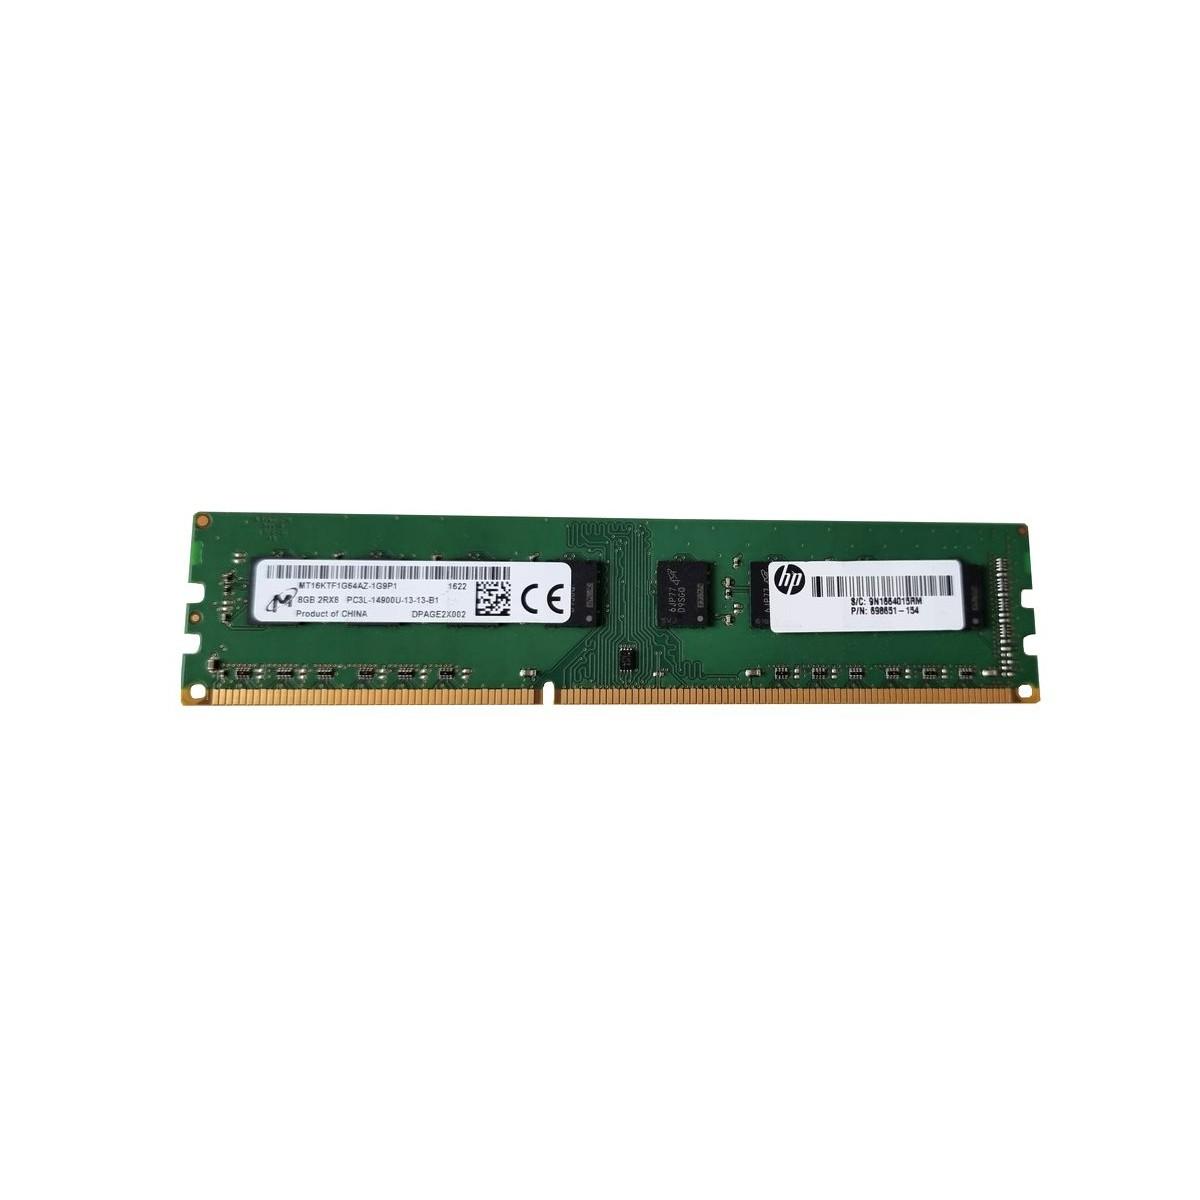 PAMIEC SAMSUNG 1GB 1Rx8 PC2-6400E M391T2863QZ3-CF7